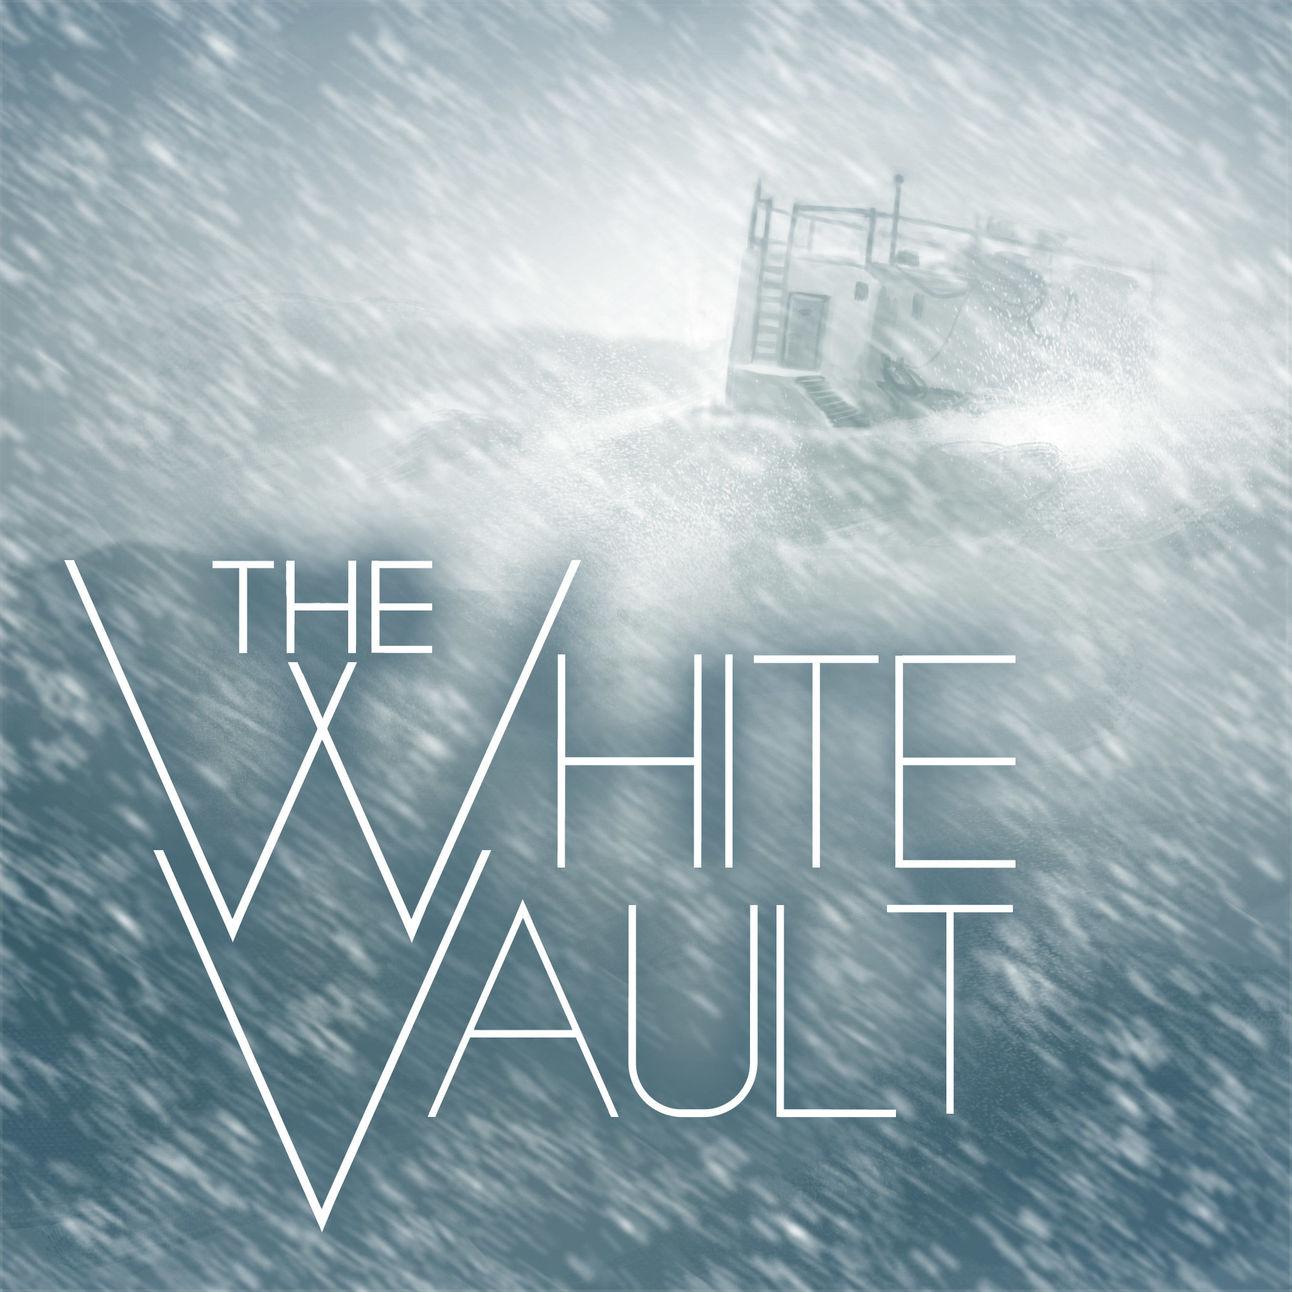 The White Vault